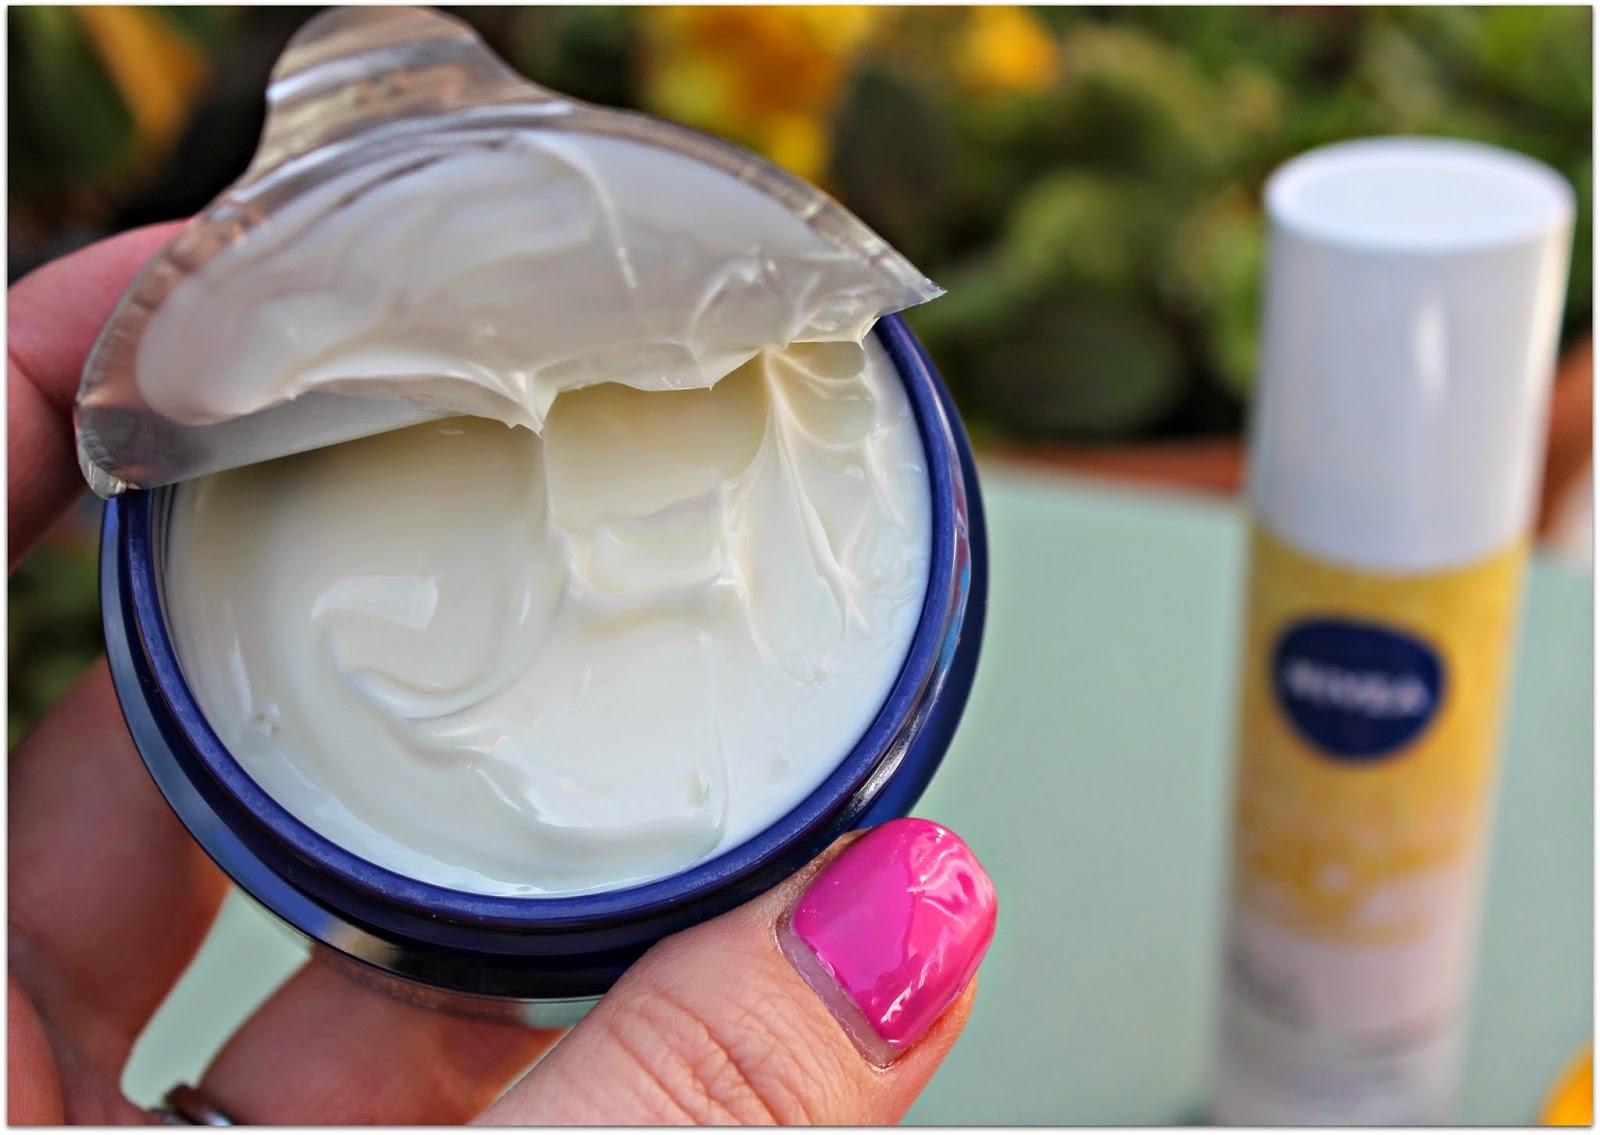 Nivea Q10 plus Anti Wrinkle eye cream